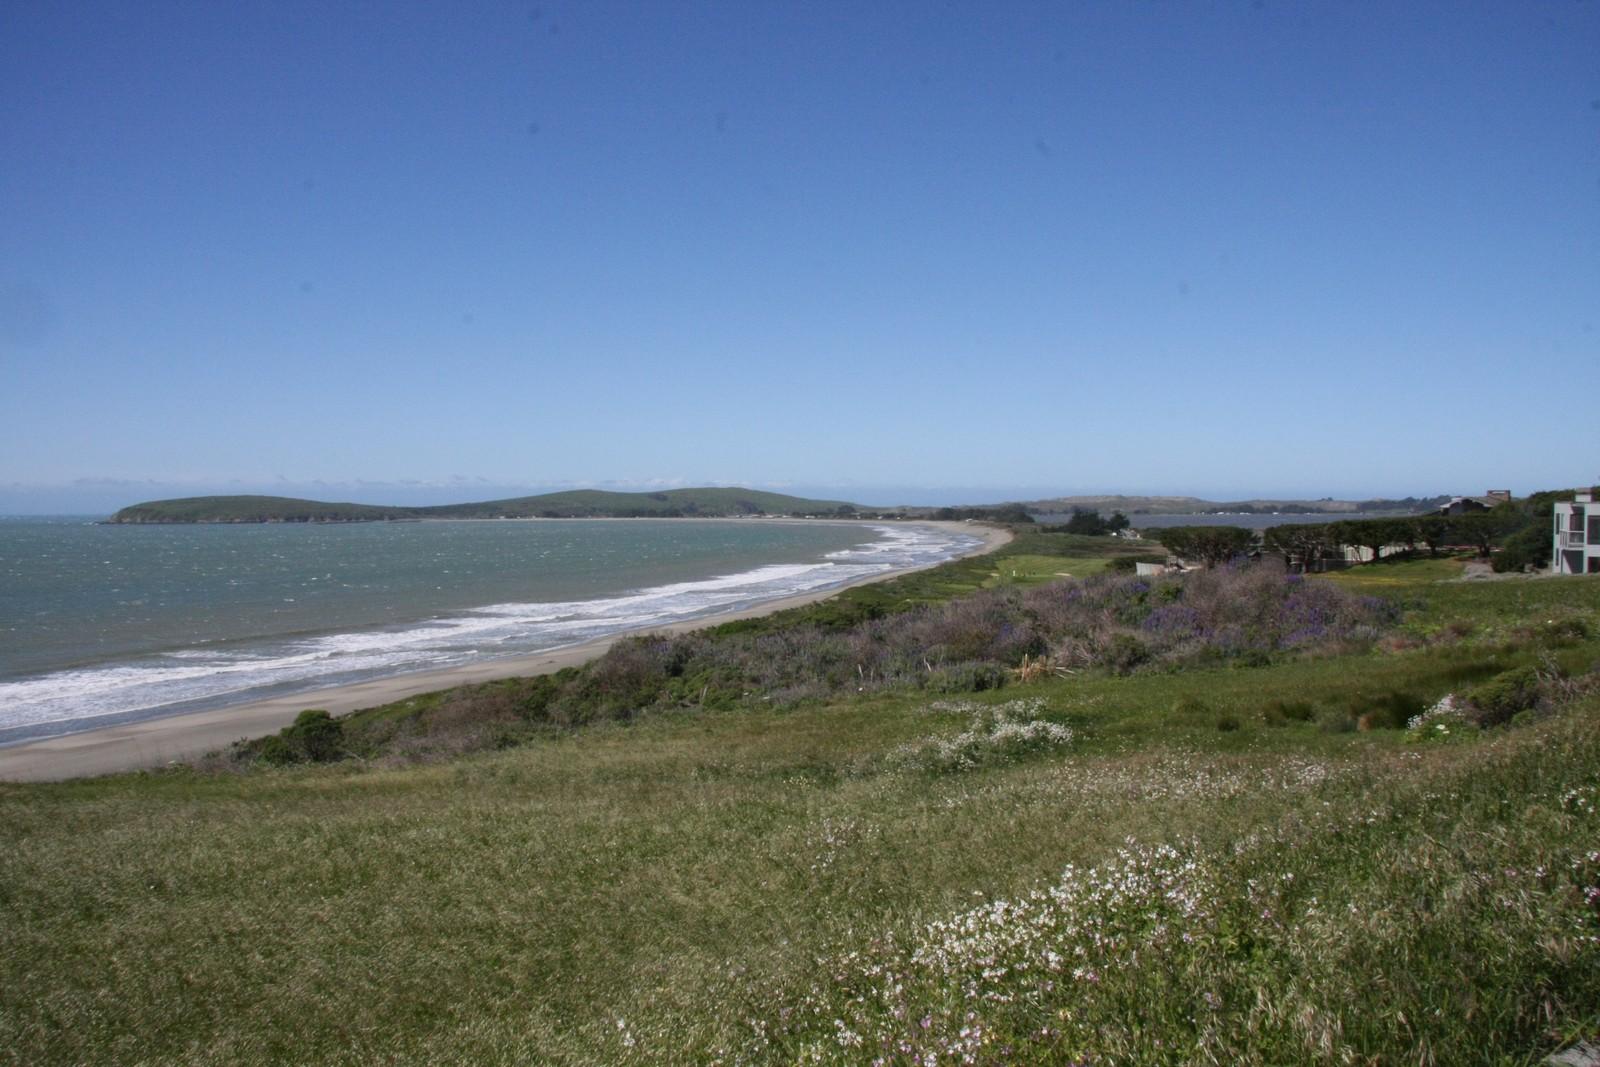 Land for Sale at 711 Gull Drive Bodega Bay, California, 94923 United States